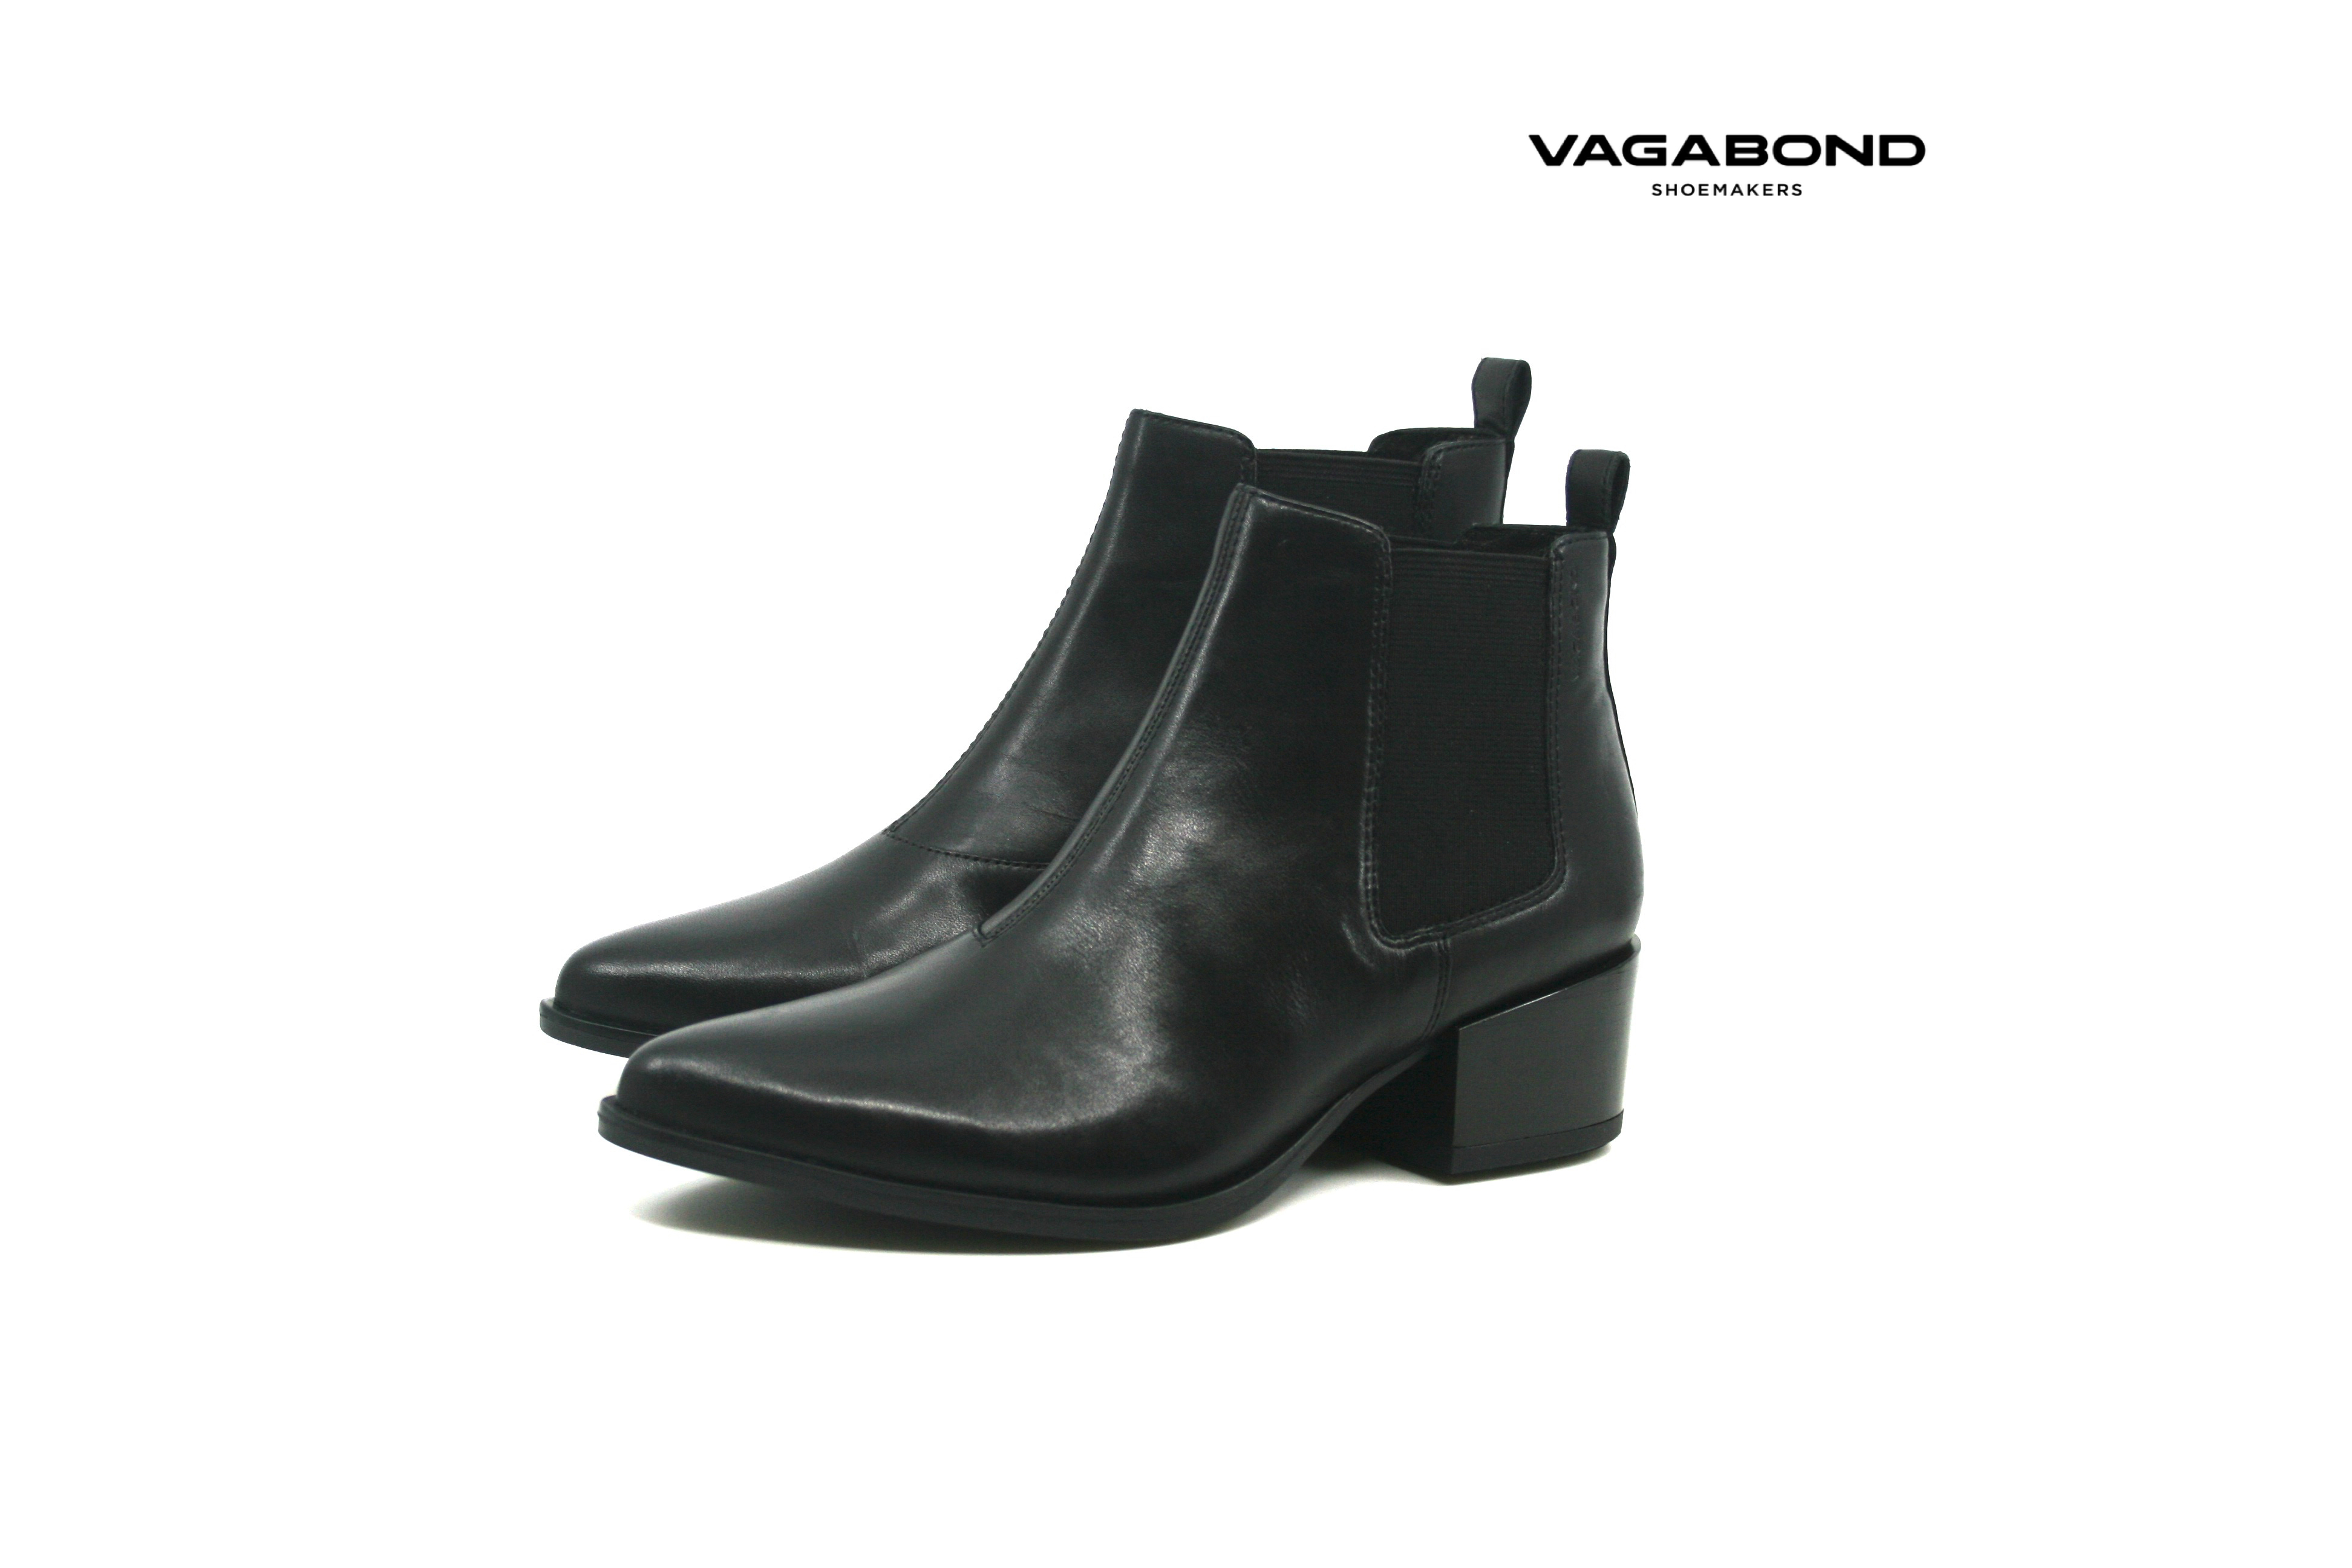 eb8042631b5 Chelsea Shop Online Støvle Dame Damkjaer Vagabond Til Sko qBxvIwCA ...